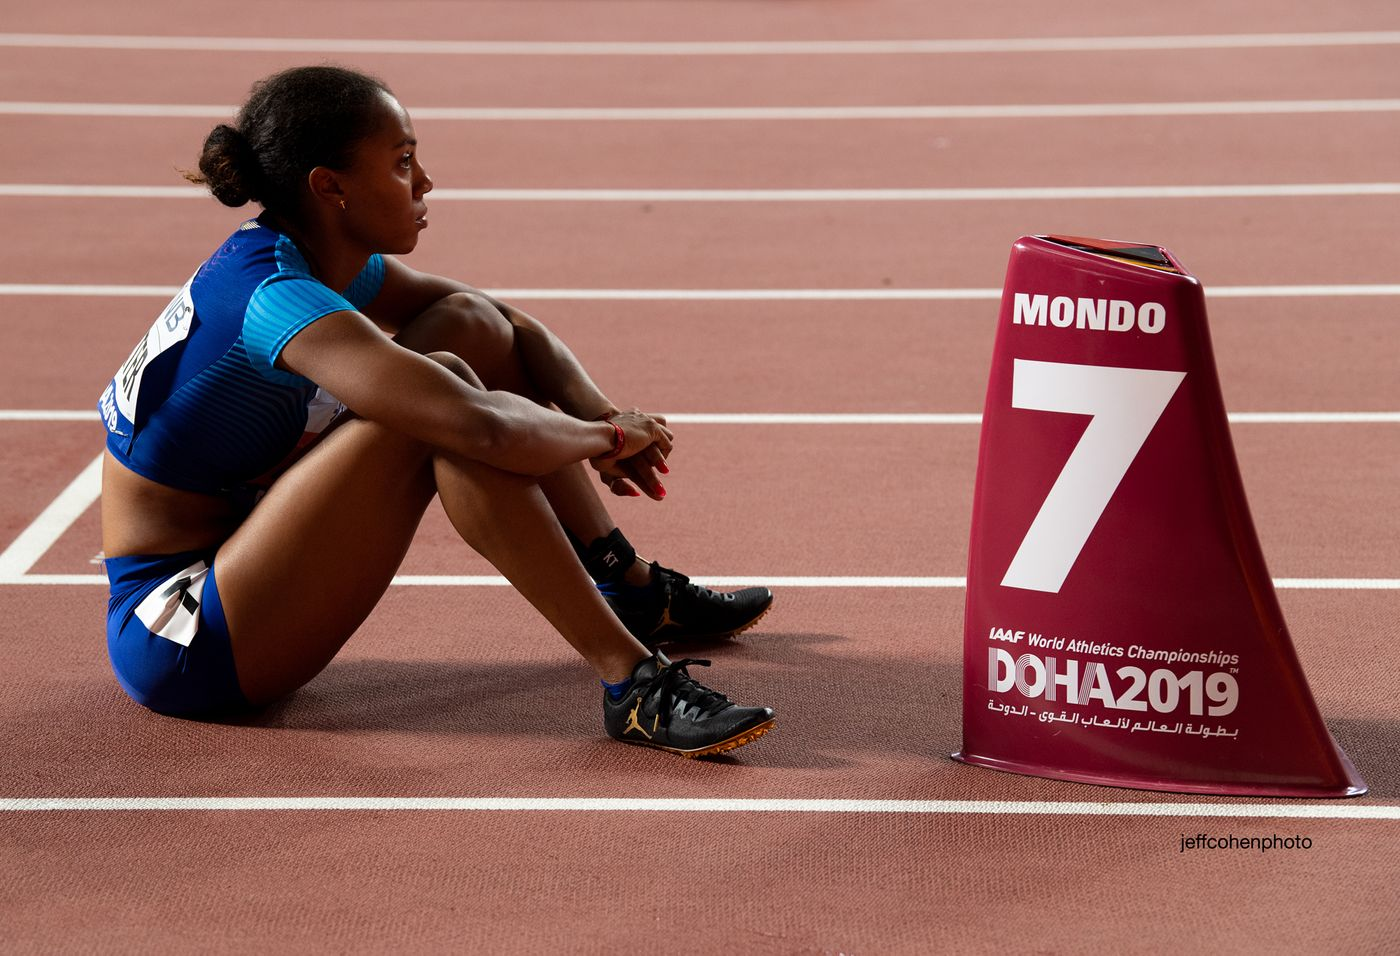 Kori Carter, 400 meter hurdles, world champion.  2019 iaaf world athletics championships doha qatar.